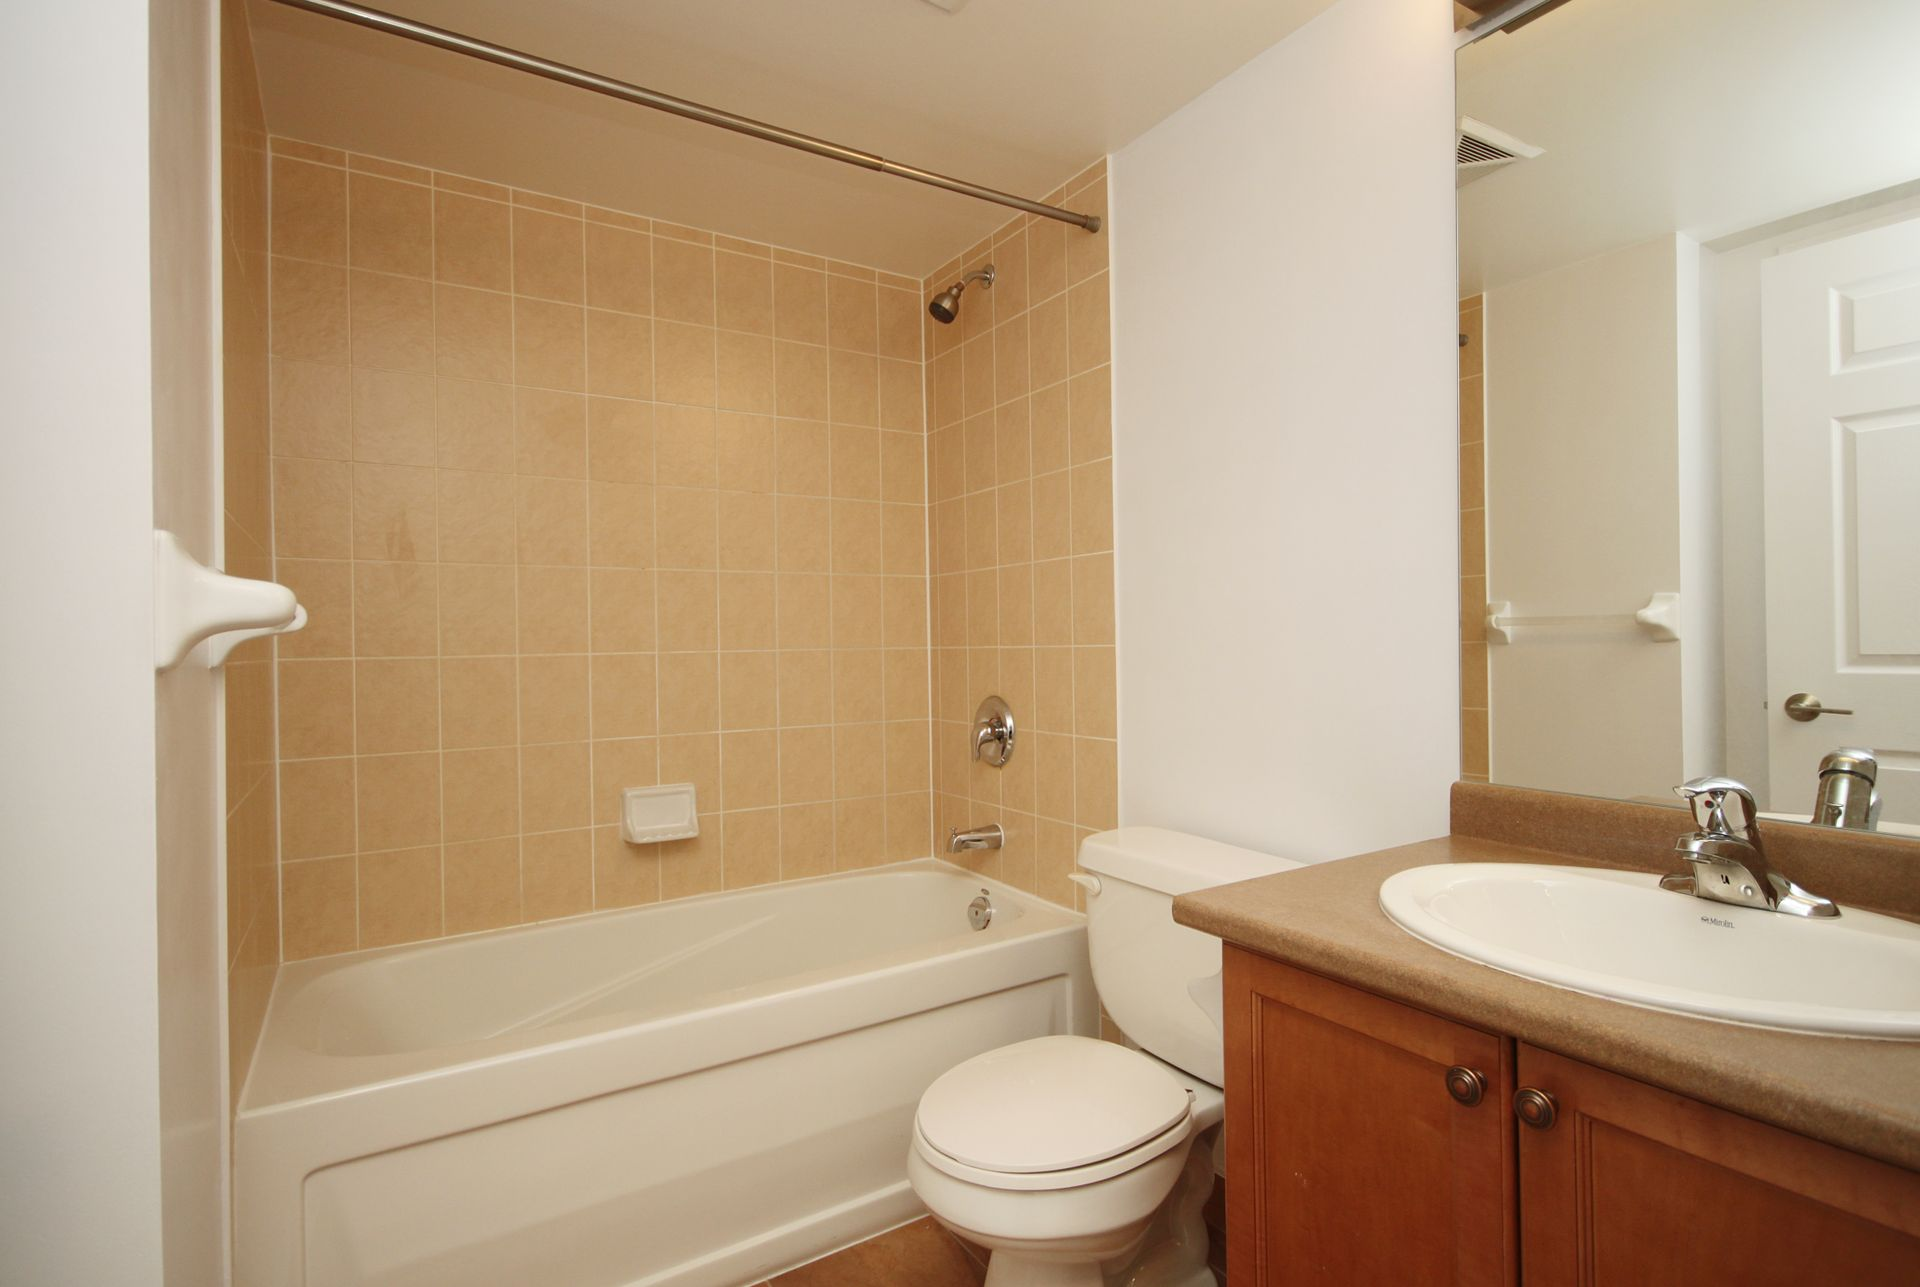 4 Piece Bathroom at 505 - 51 Lower Simcoe Street, Waterfront Communities C1, Toronto